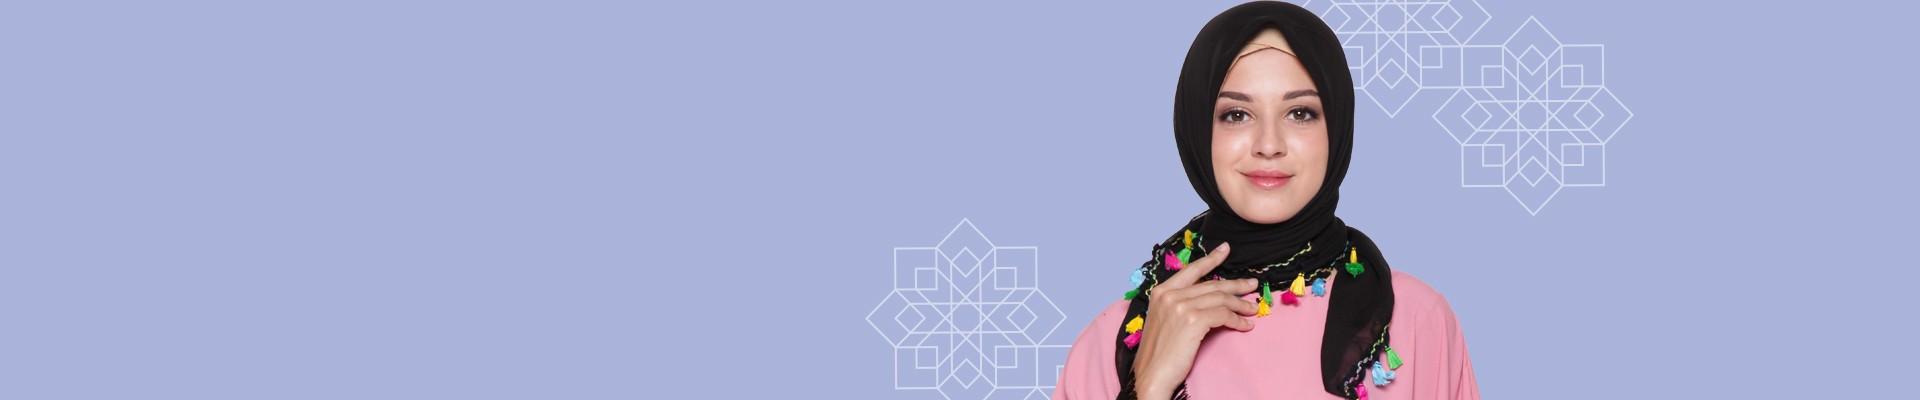 Jual Hijab Segi Empat Terbaru & Terlengkap